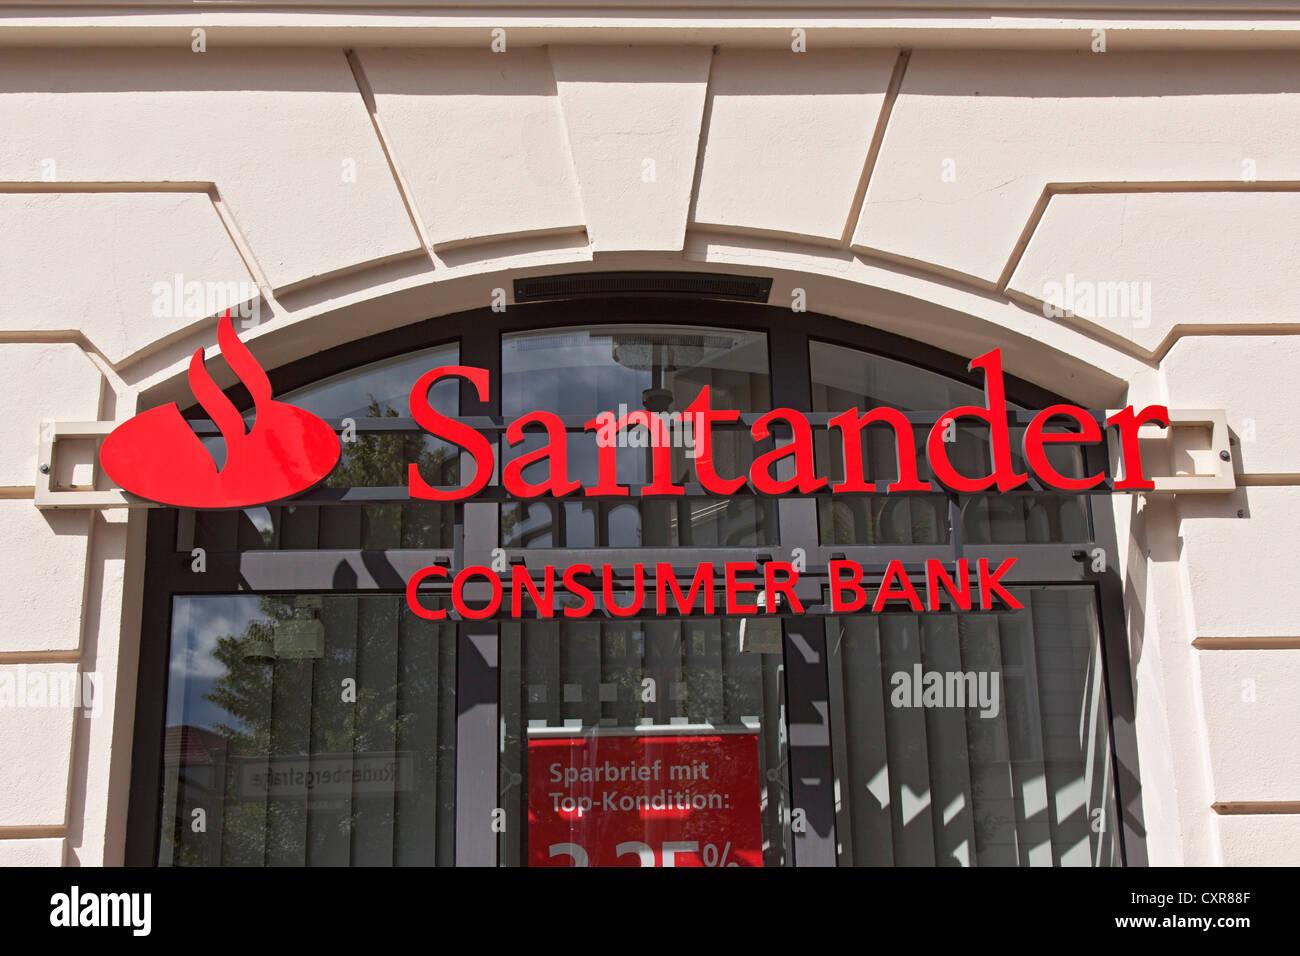 Branch of Santander Bank, consumer bank, Berlin, Germany, Europe - Stock Image